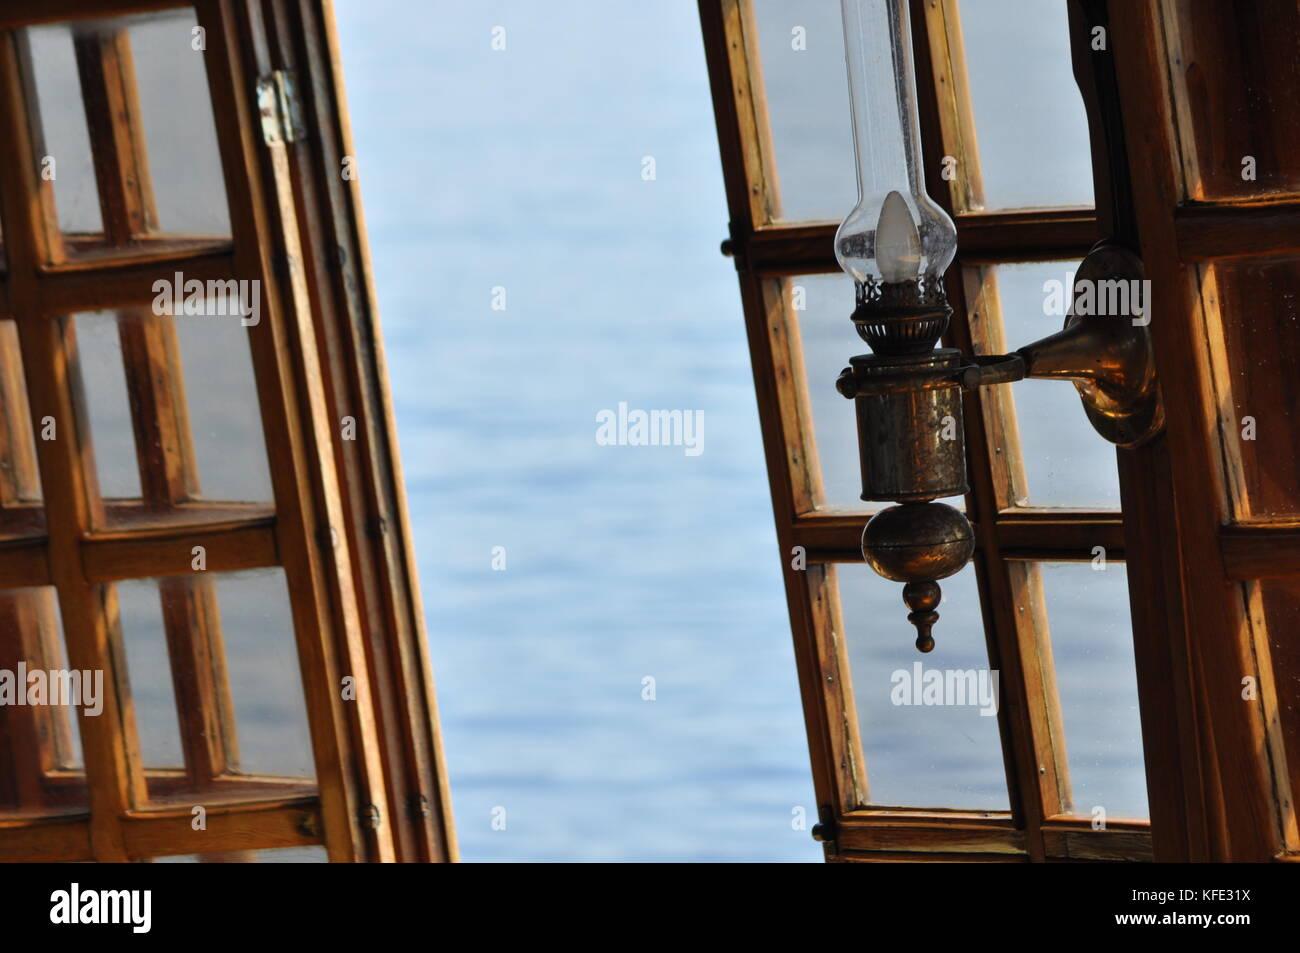 Sea view through the open window. Kerosene lamp on the ship. - Stock Image